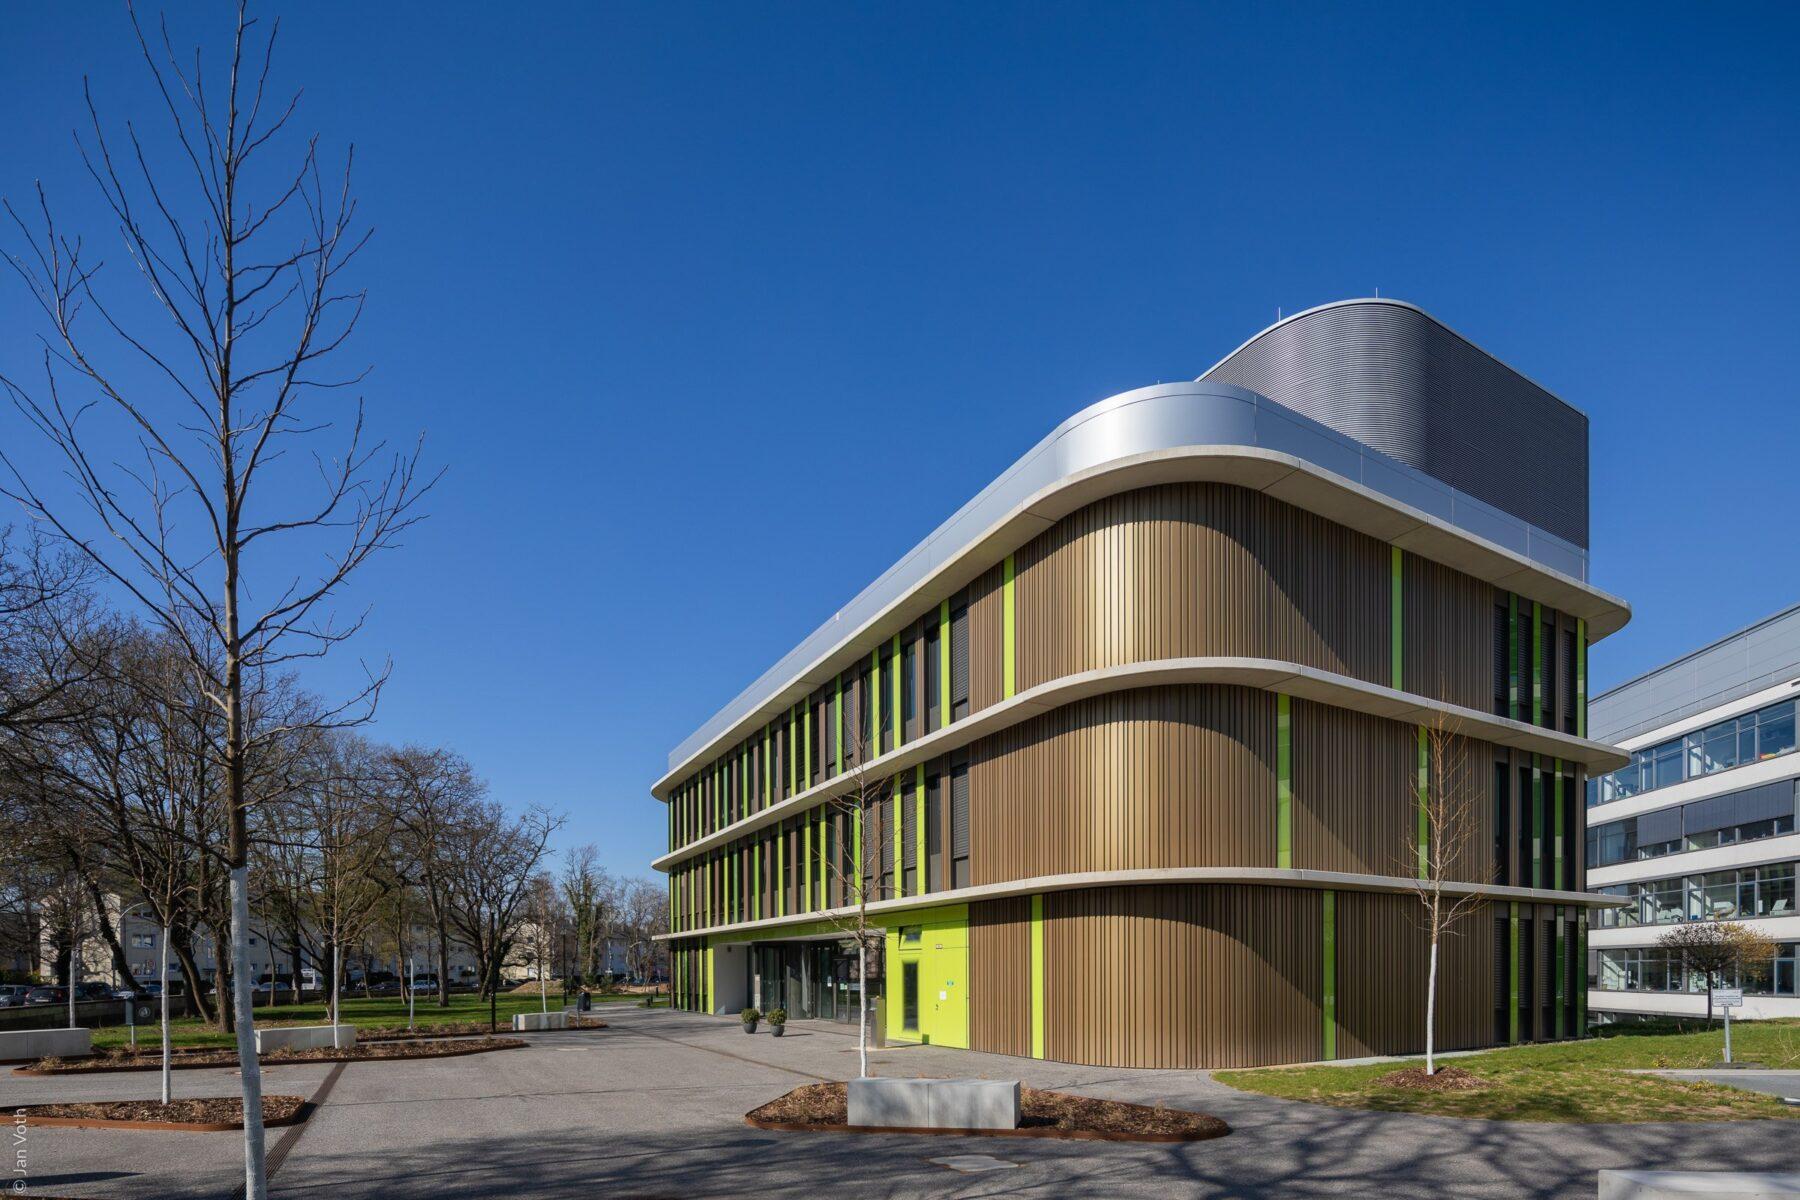 Uniklinik Campus Venusberg Bonn